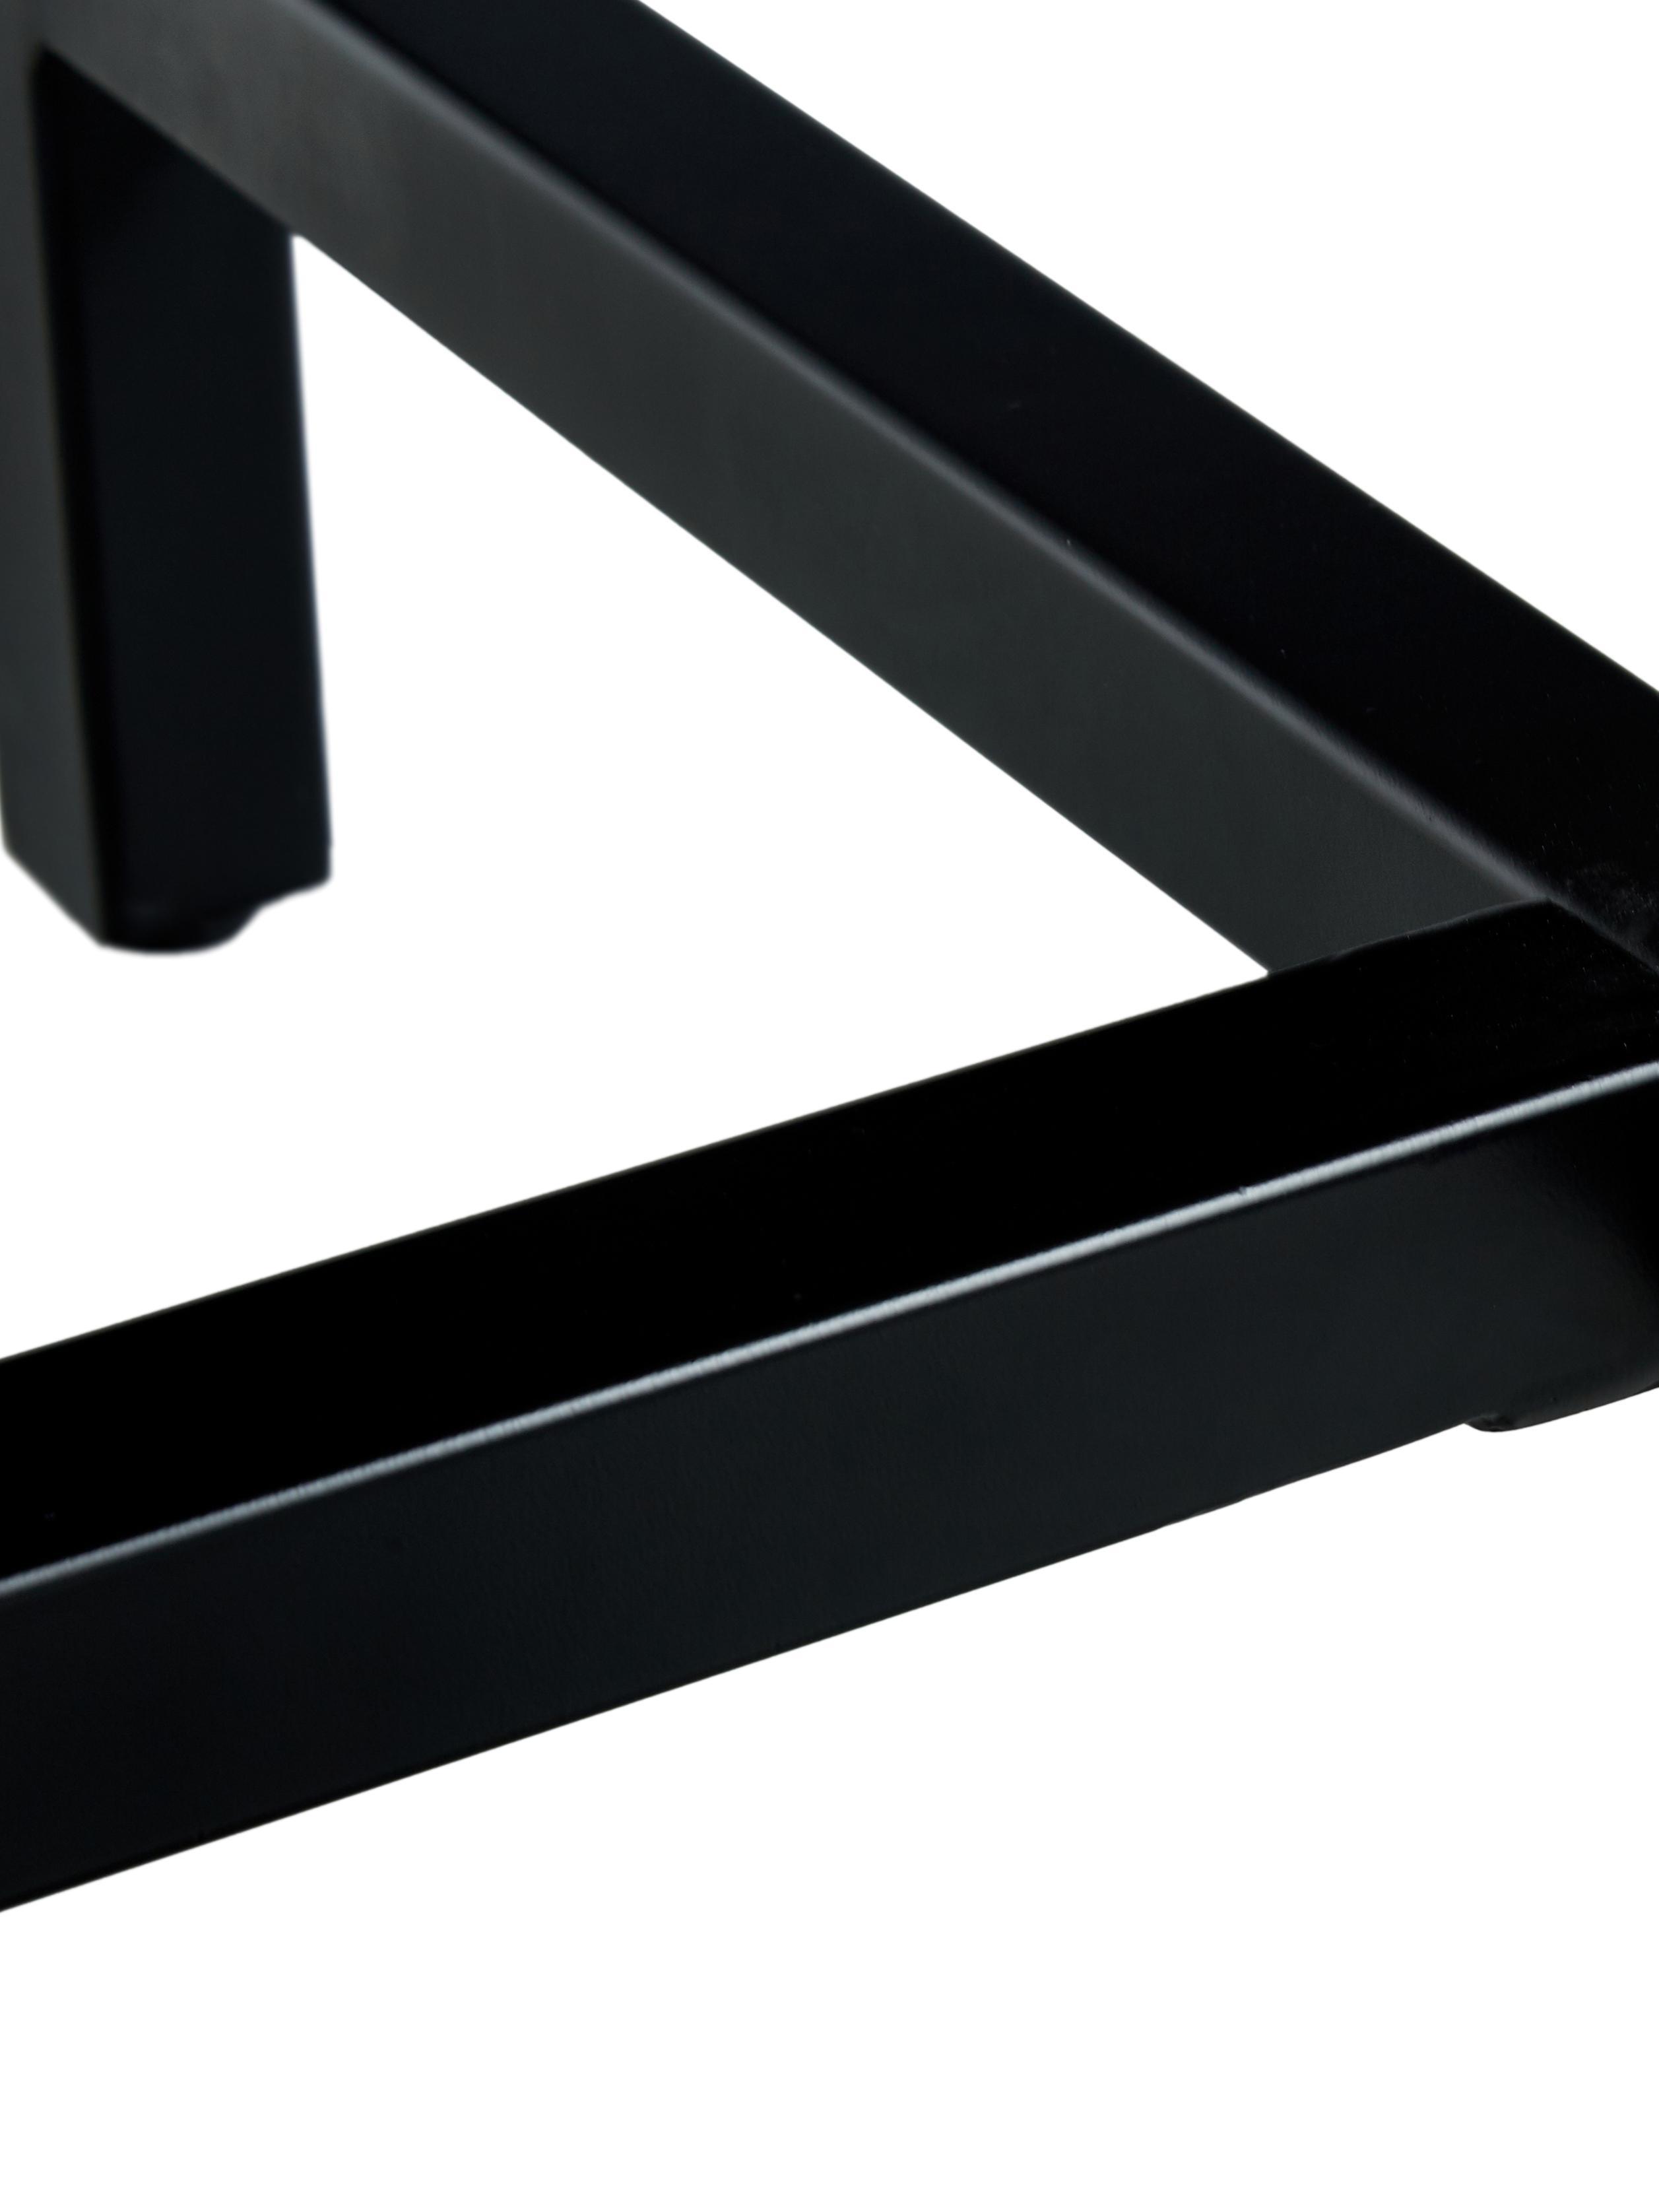 Esstisch Raw mit Massivholzplatte, Tischplatte: Massives Mangoholz, gebür, Gestell: Metall, pulverbeschichtet, Tischplatte: Mangoholz, schwarz lackiert Gestell: Schwarz, matt, B 180 x T 90 cm